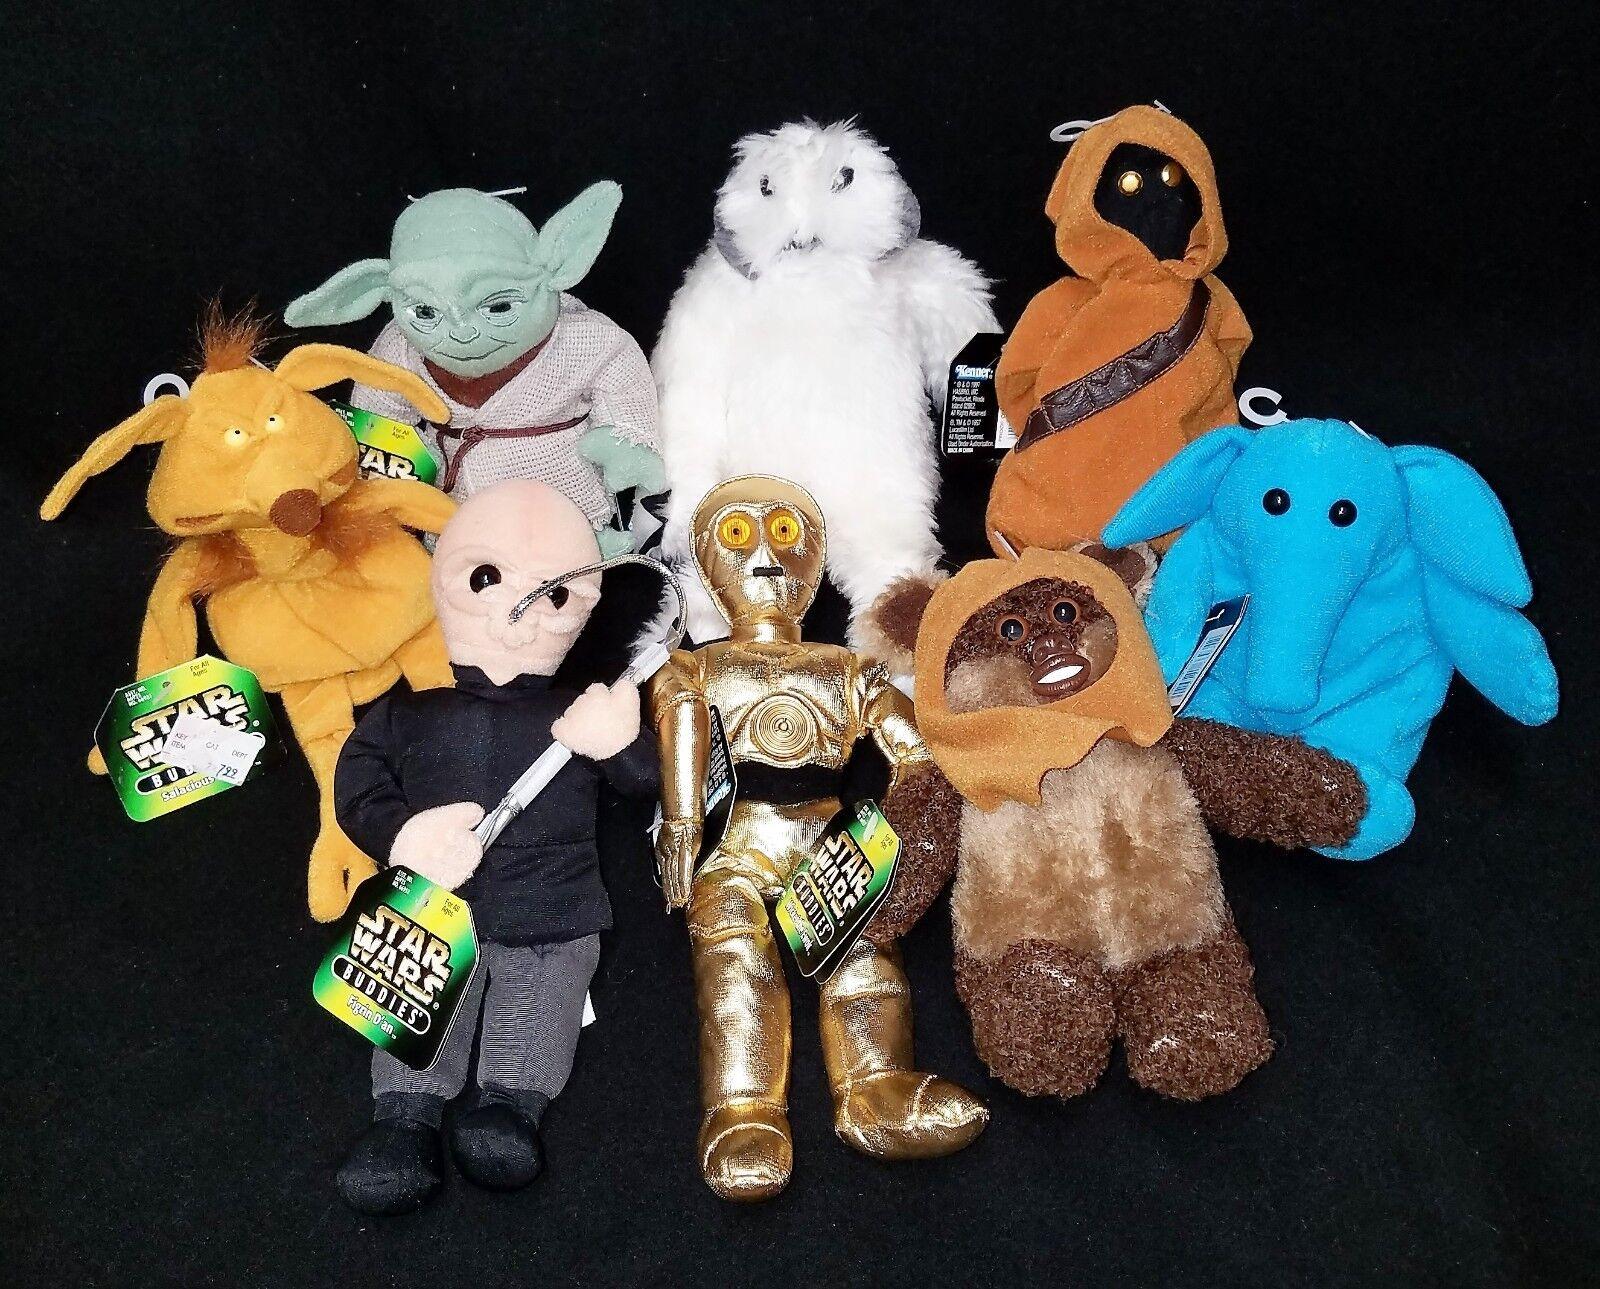 LOT 8 New Star Wars BEANIES Kenner 1998 Yoda C3PO Figrin Ewok Crumb Wampa Rebo